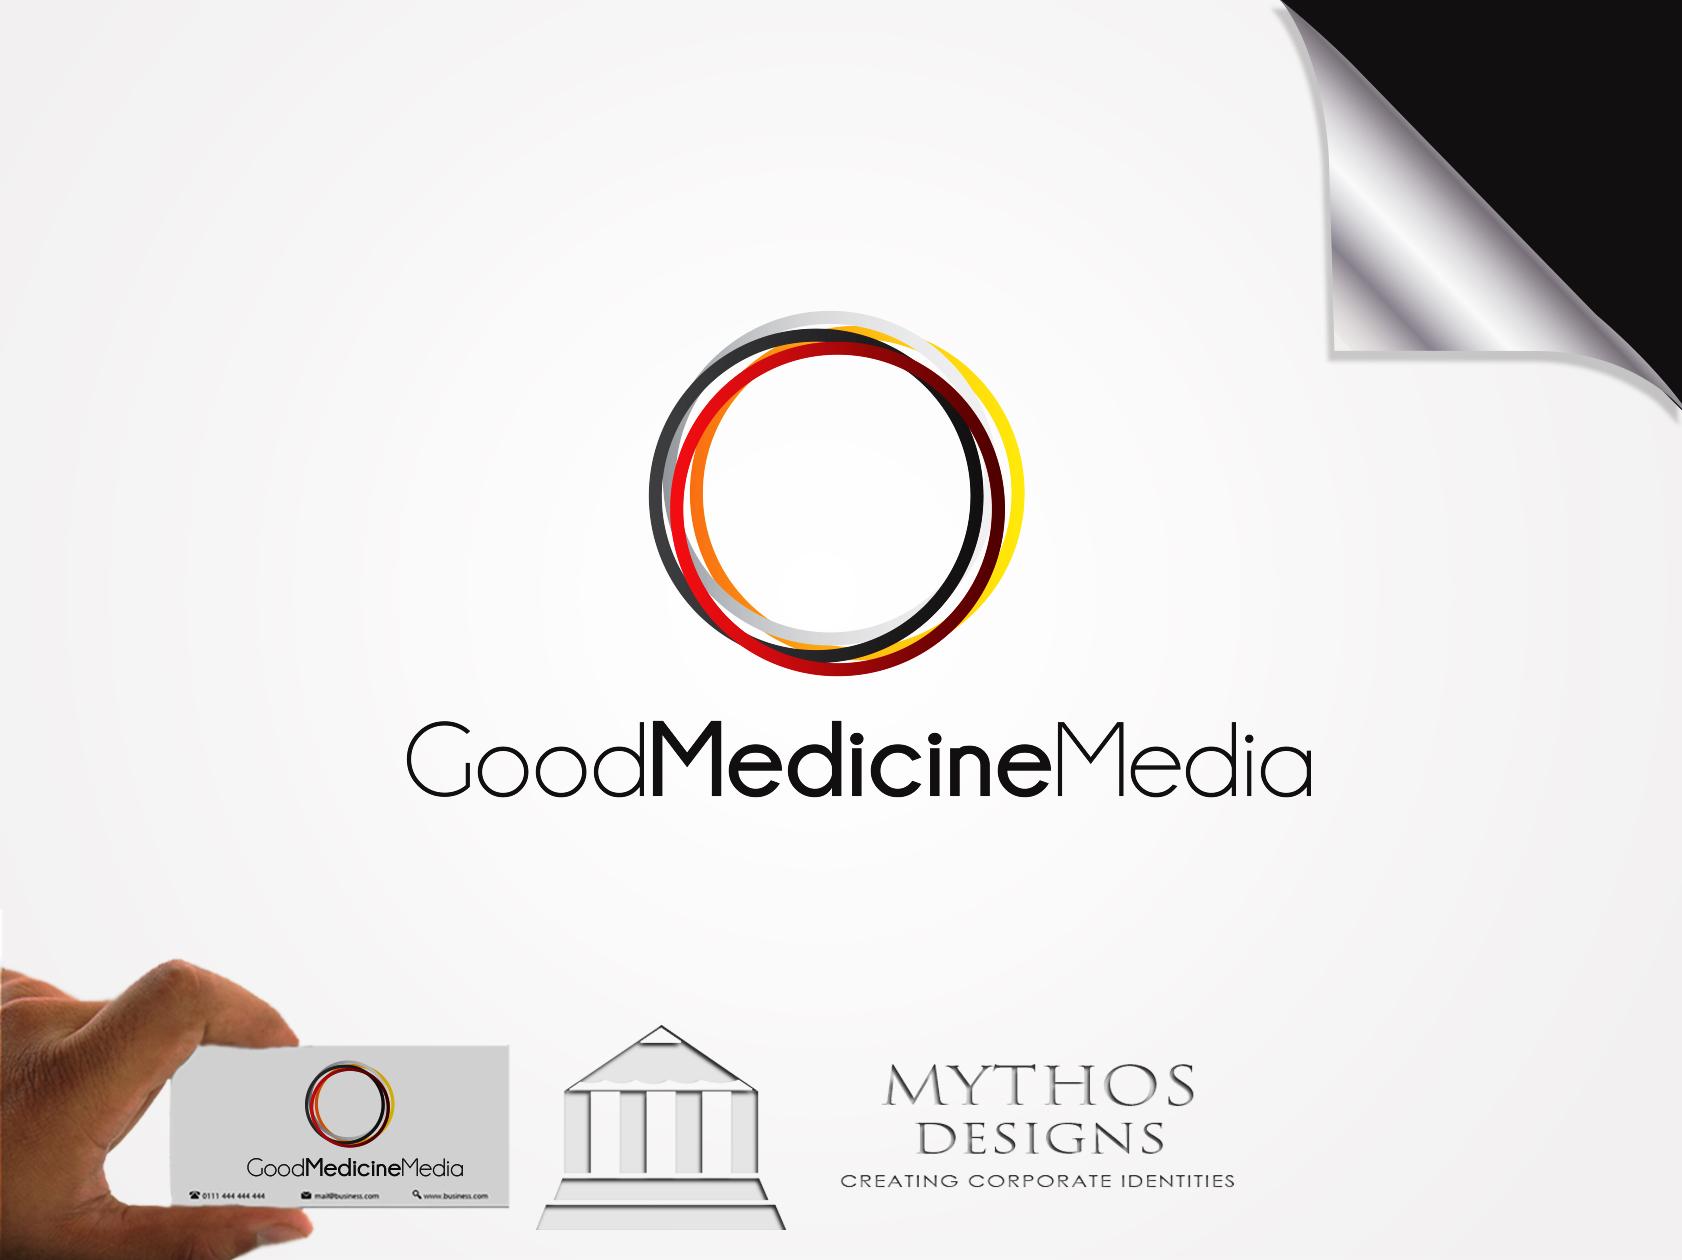 Logo Design by Mythos Designs - Entry No. 248 in the Logo Design Contest Good Medicine Media Logo Design.